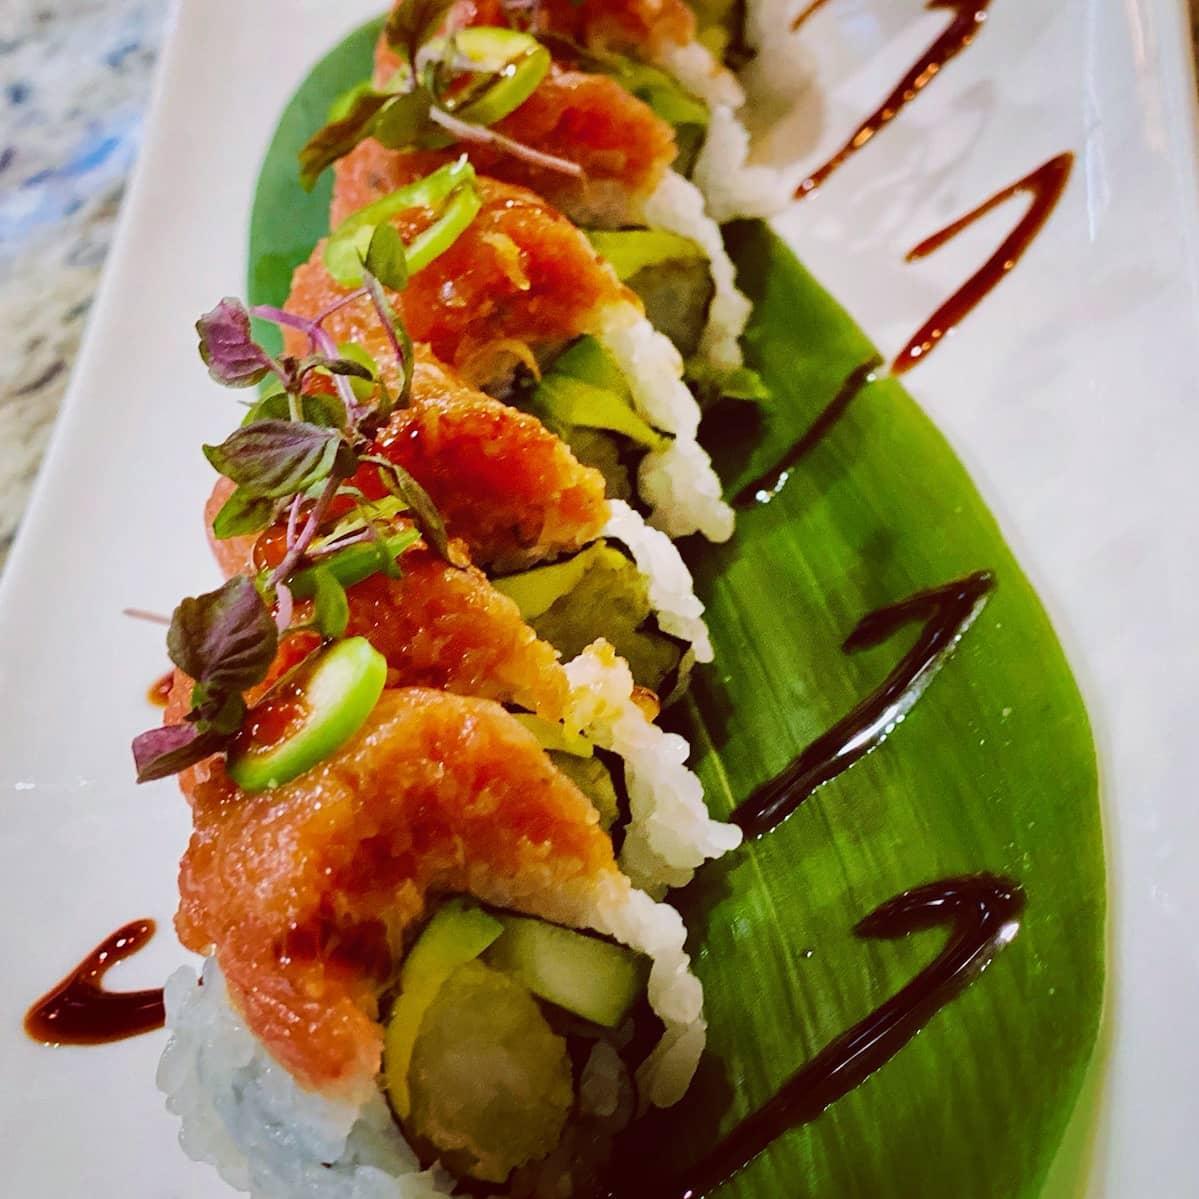 A sushi roll on a banana leaf